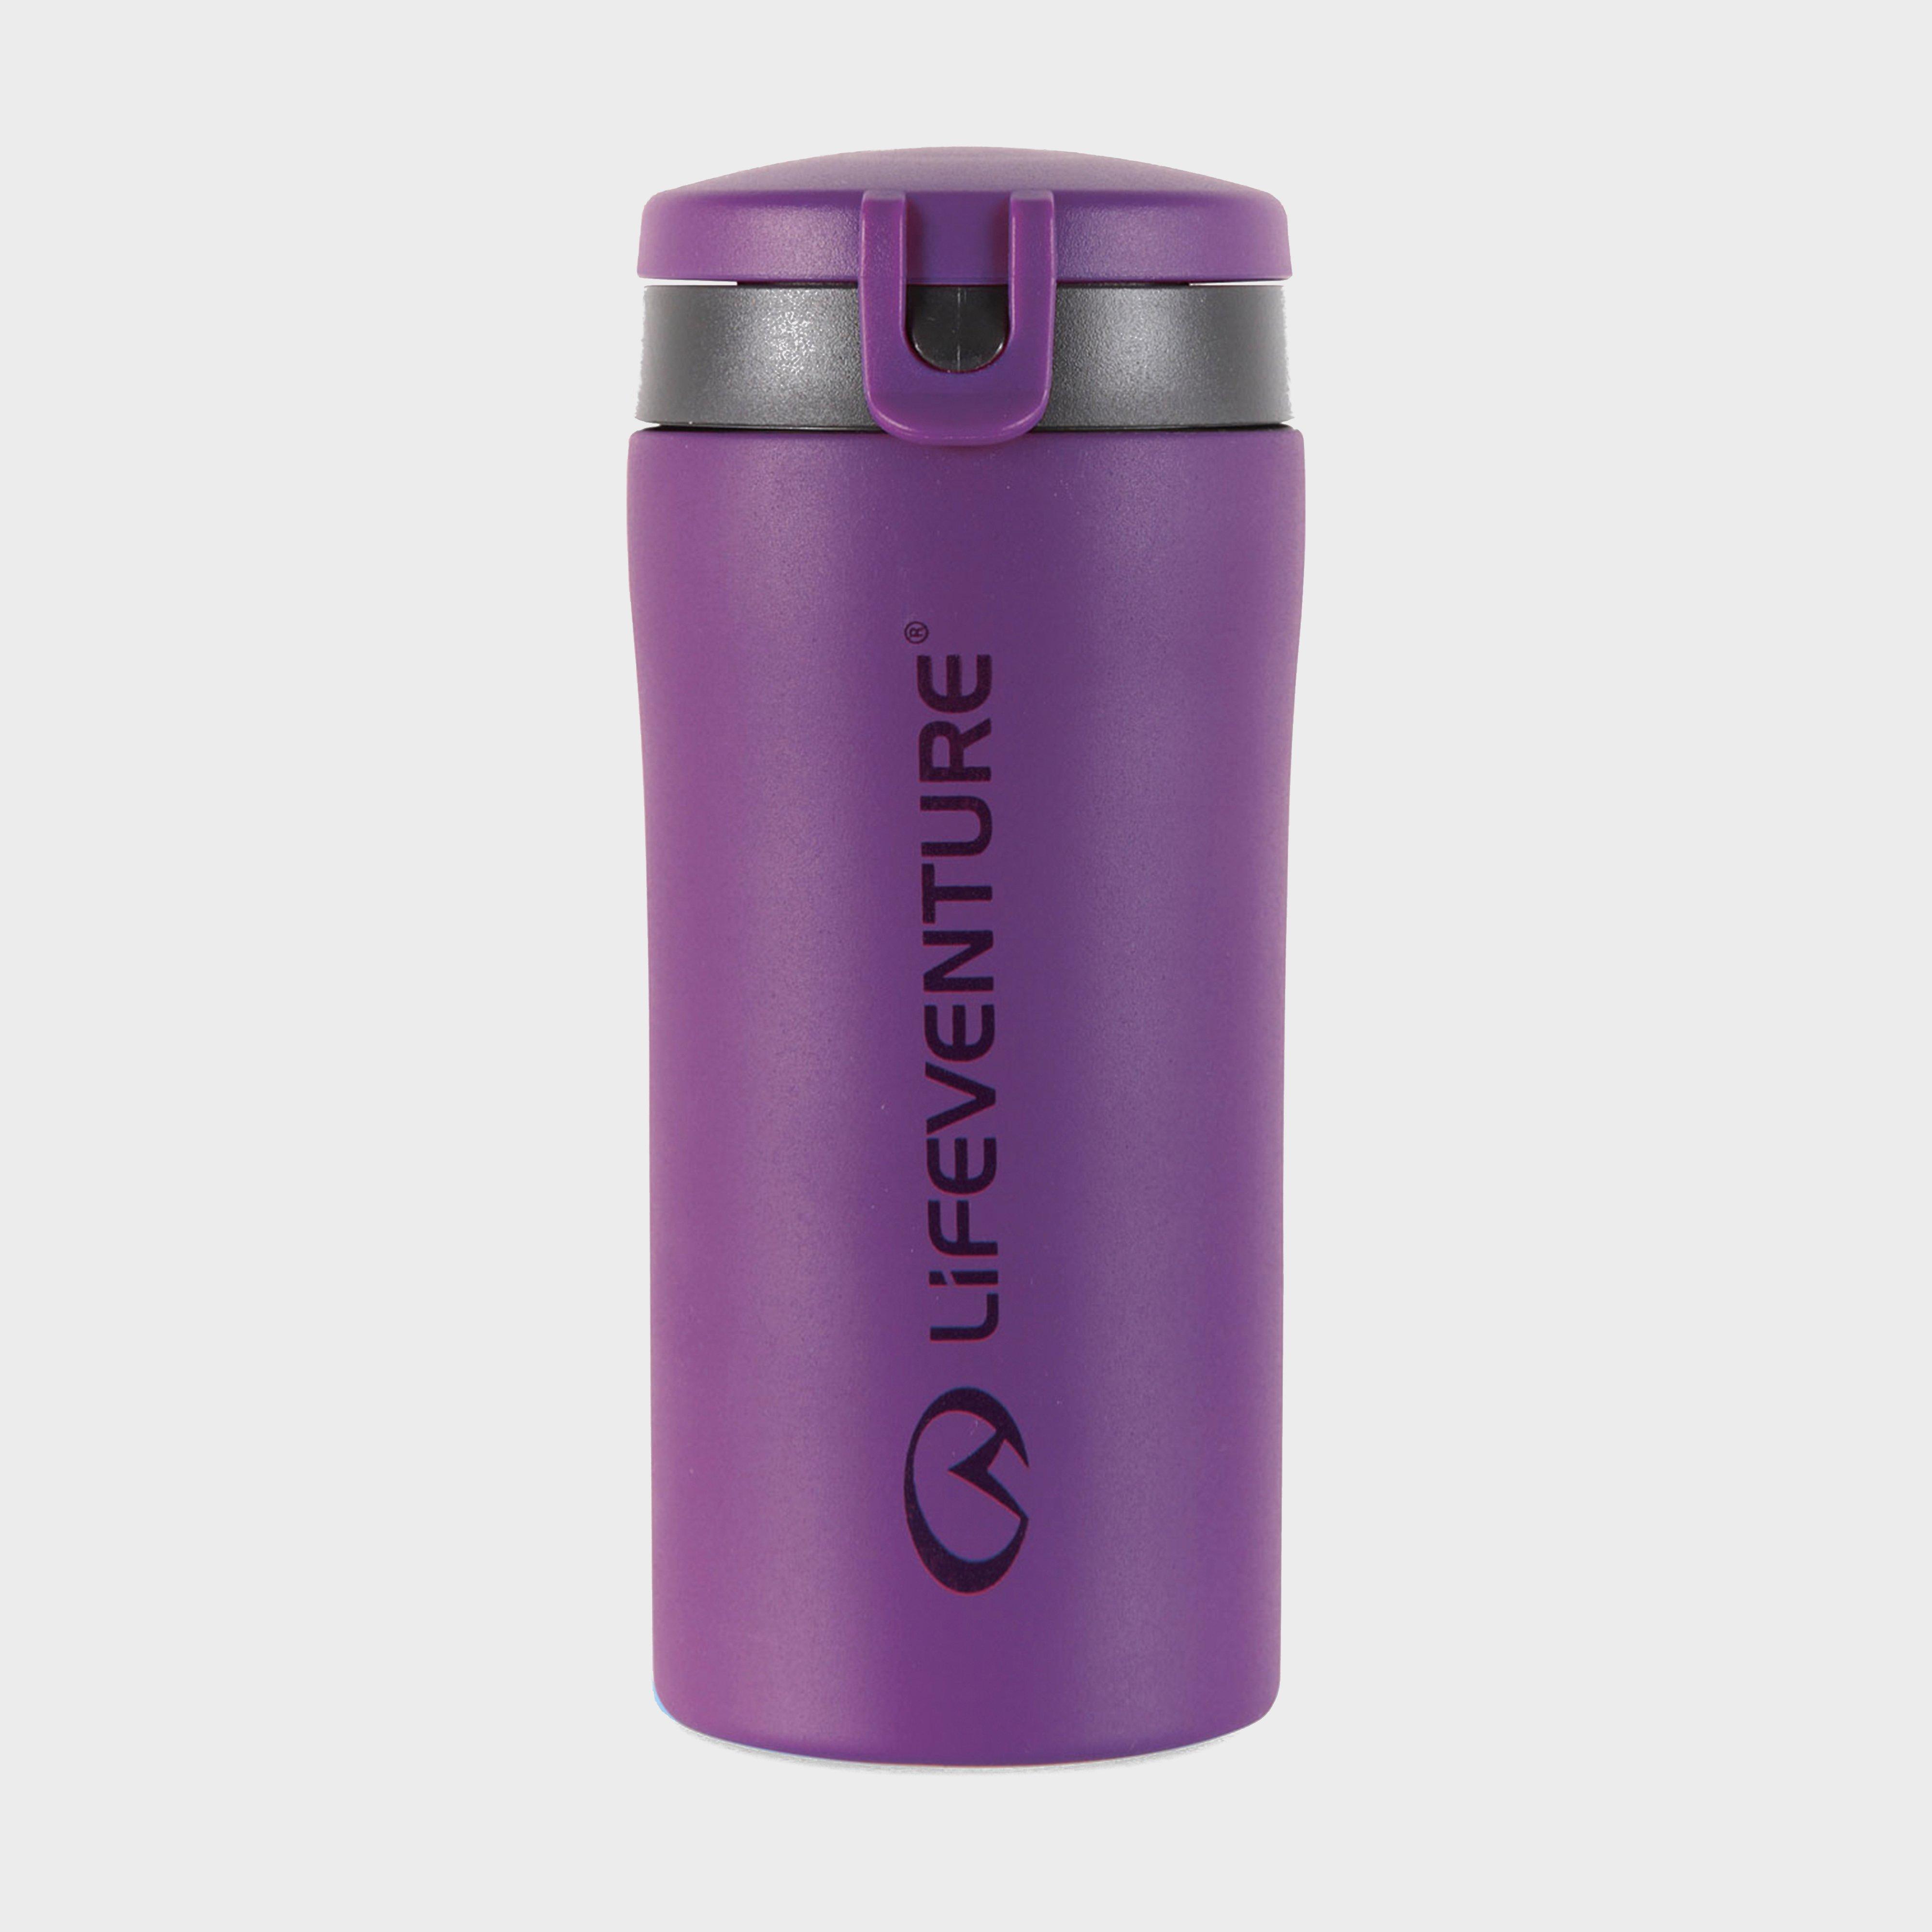 Image of Lifeventure Flip-Top Thermal Mug - Purple/300M, Purple/300M